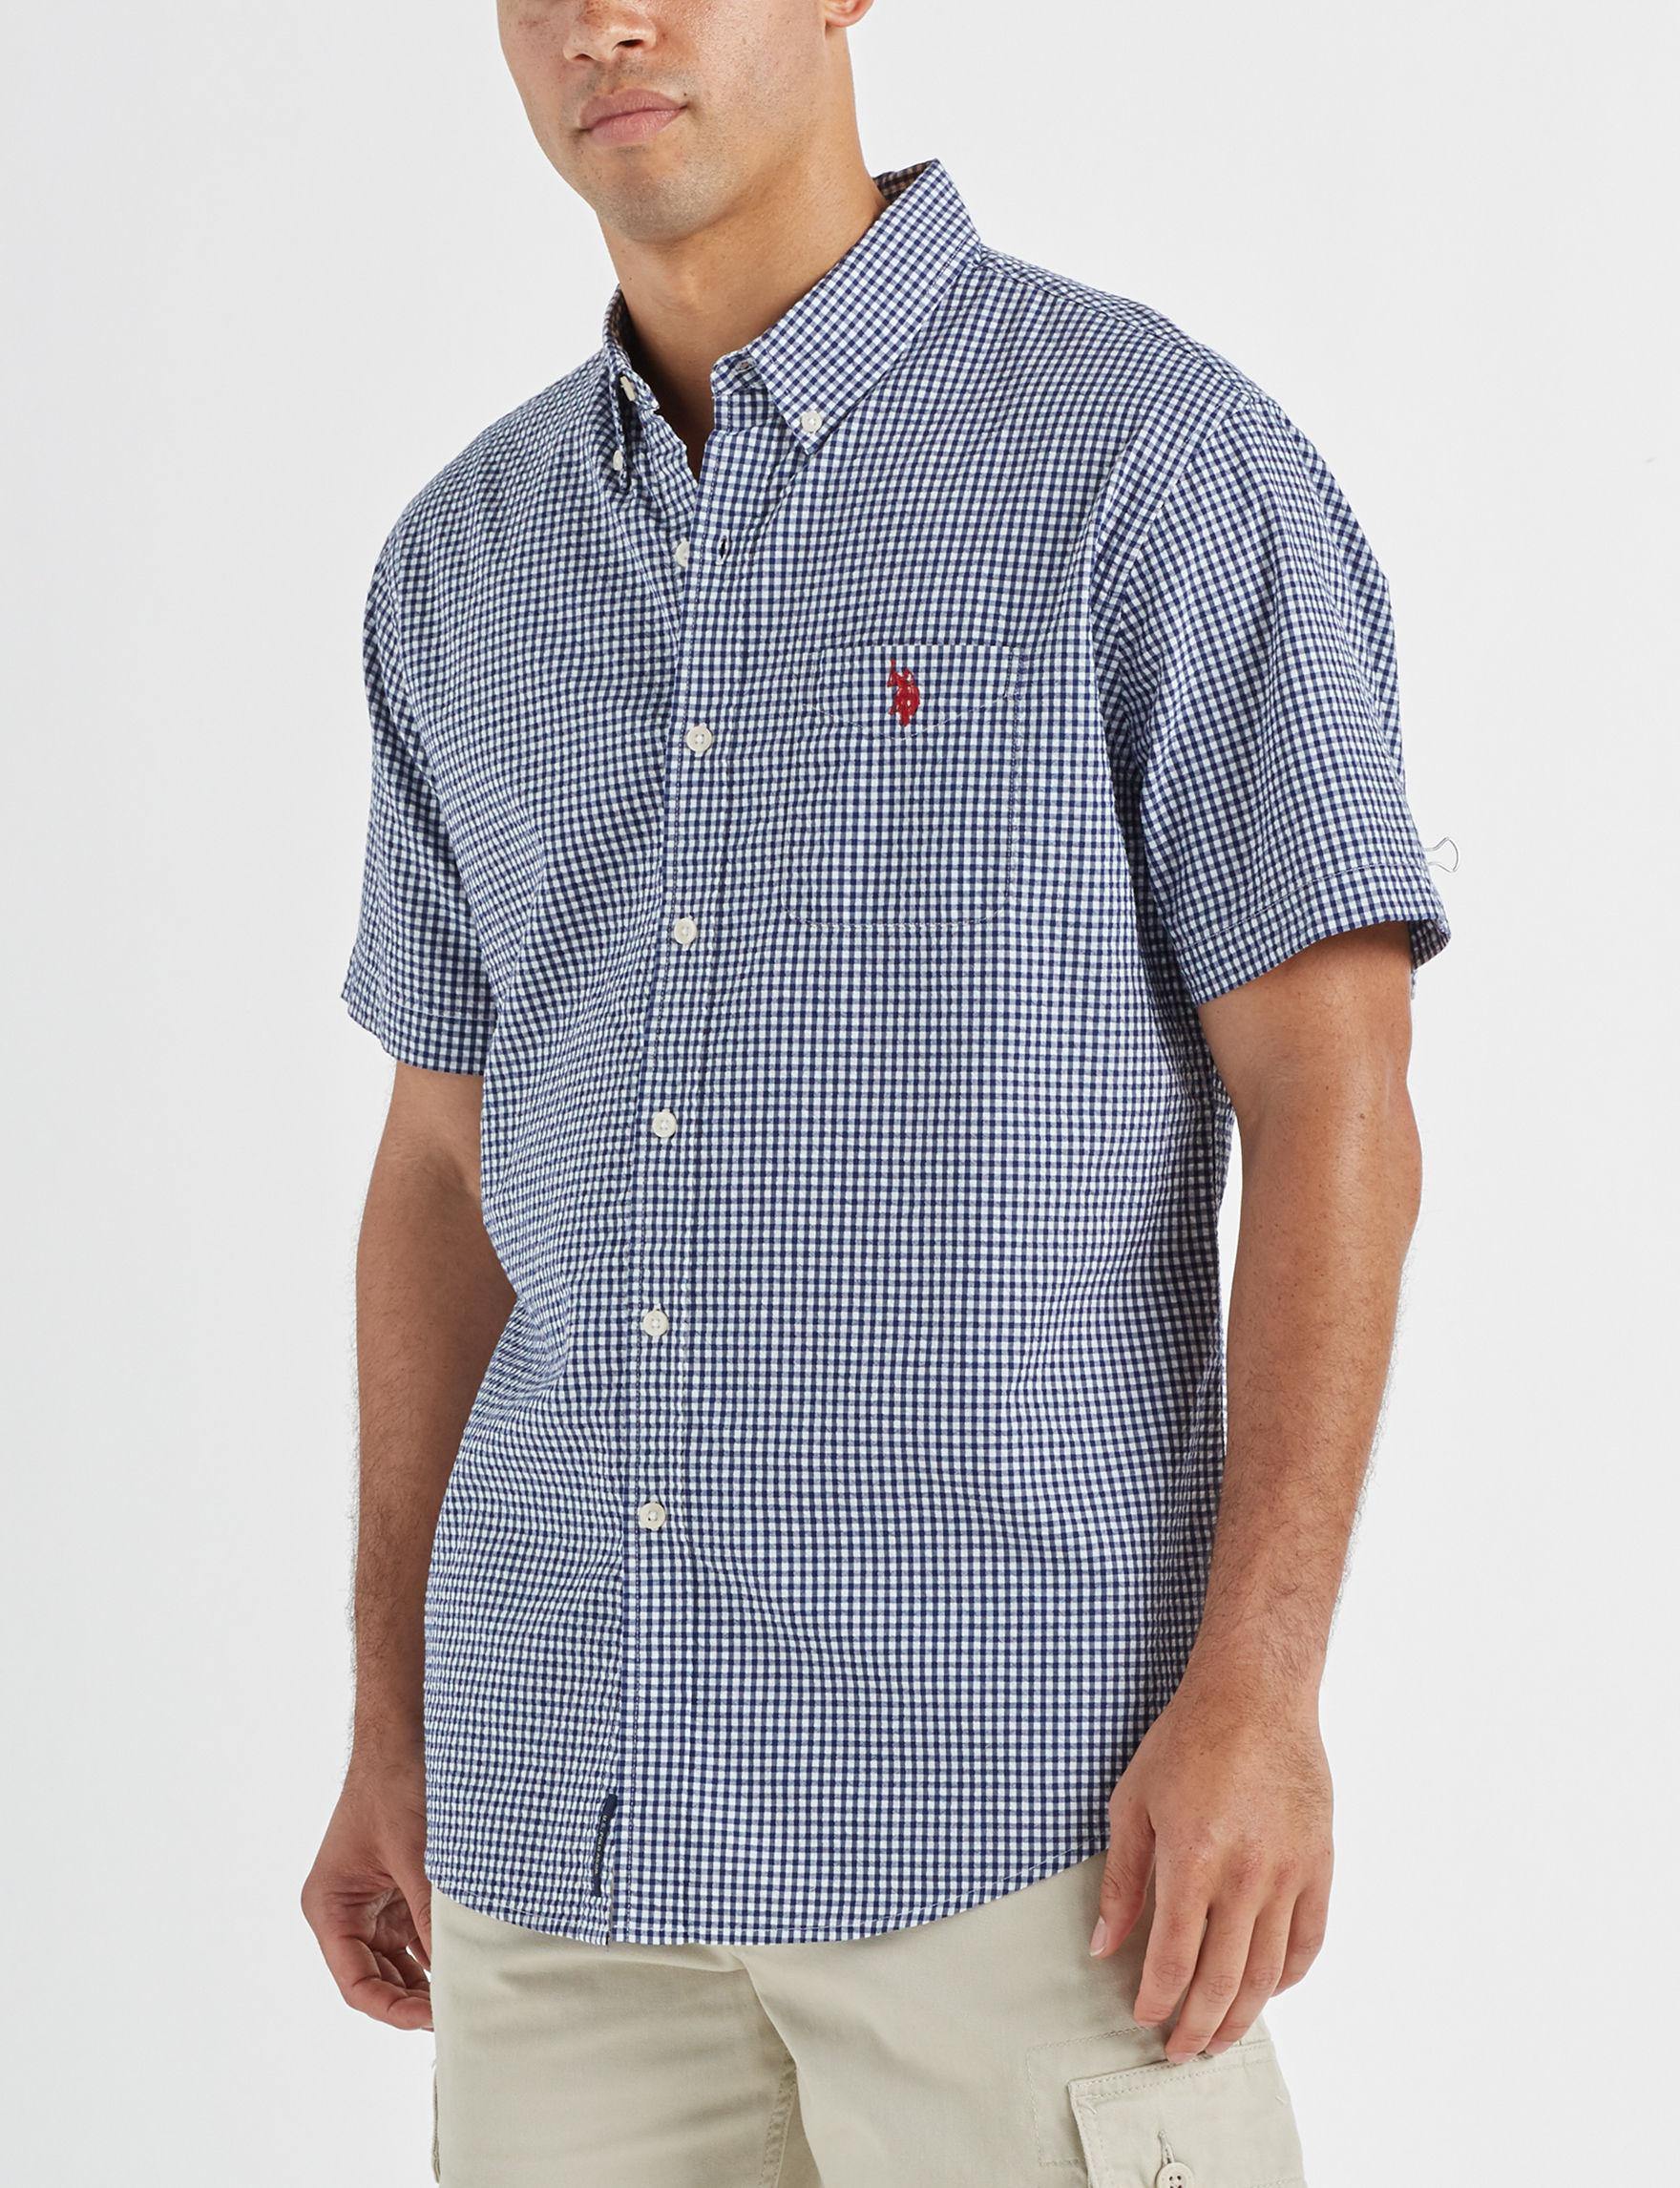 U.S. Polo Assn. Blue / Multi Casual Button Down Shirts